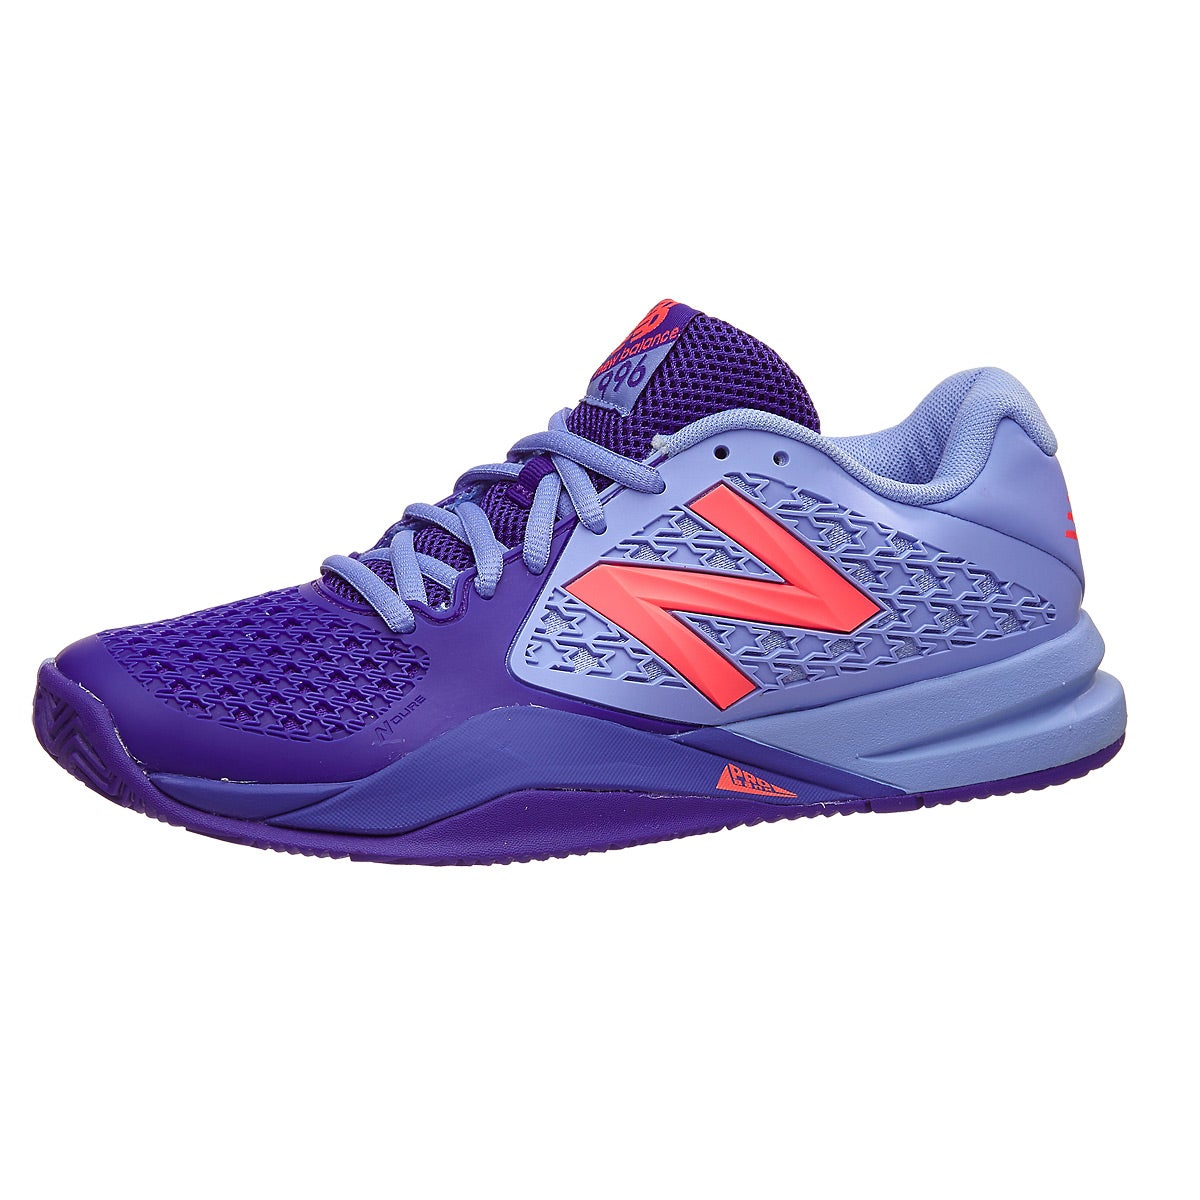 new zealand pink blue womens new balance 360 shoes 3c468 1fa5c